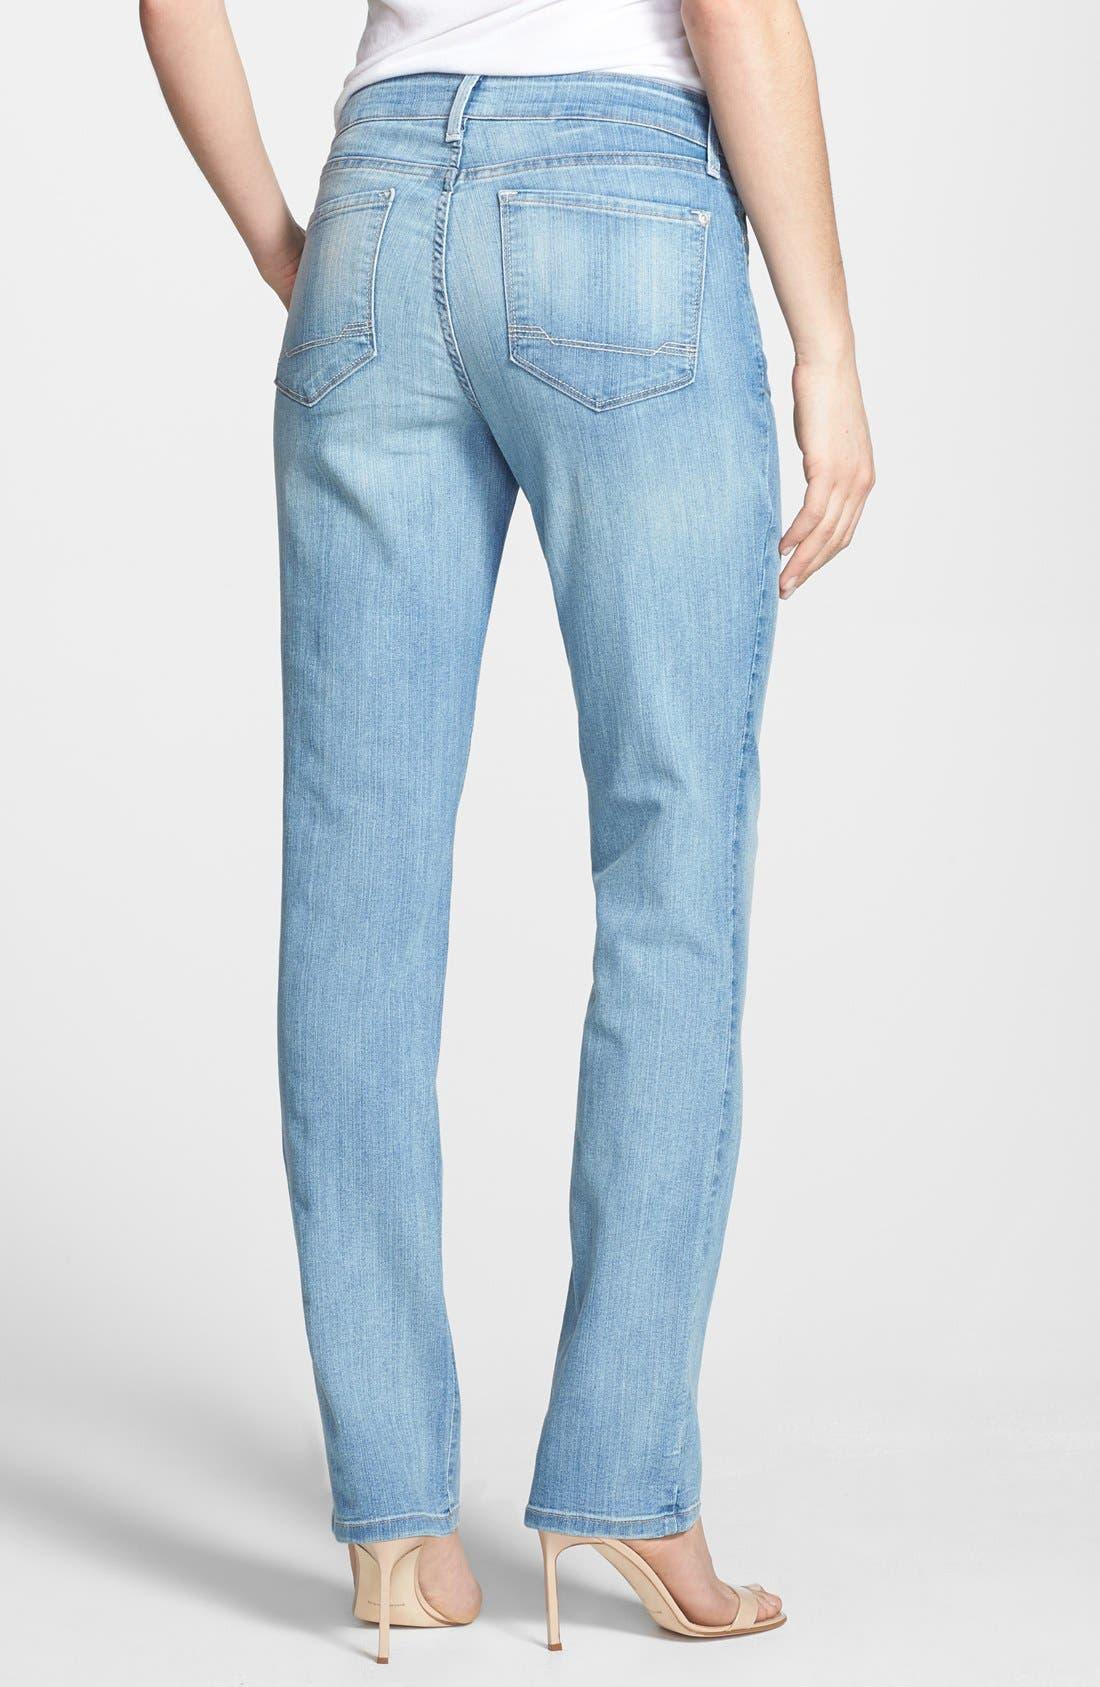 Alternate Image 2  - NYDJ 'Sheri' Stretch Skinny Jeans (Manhattan Beach)